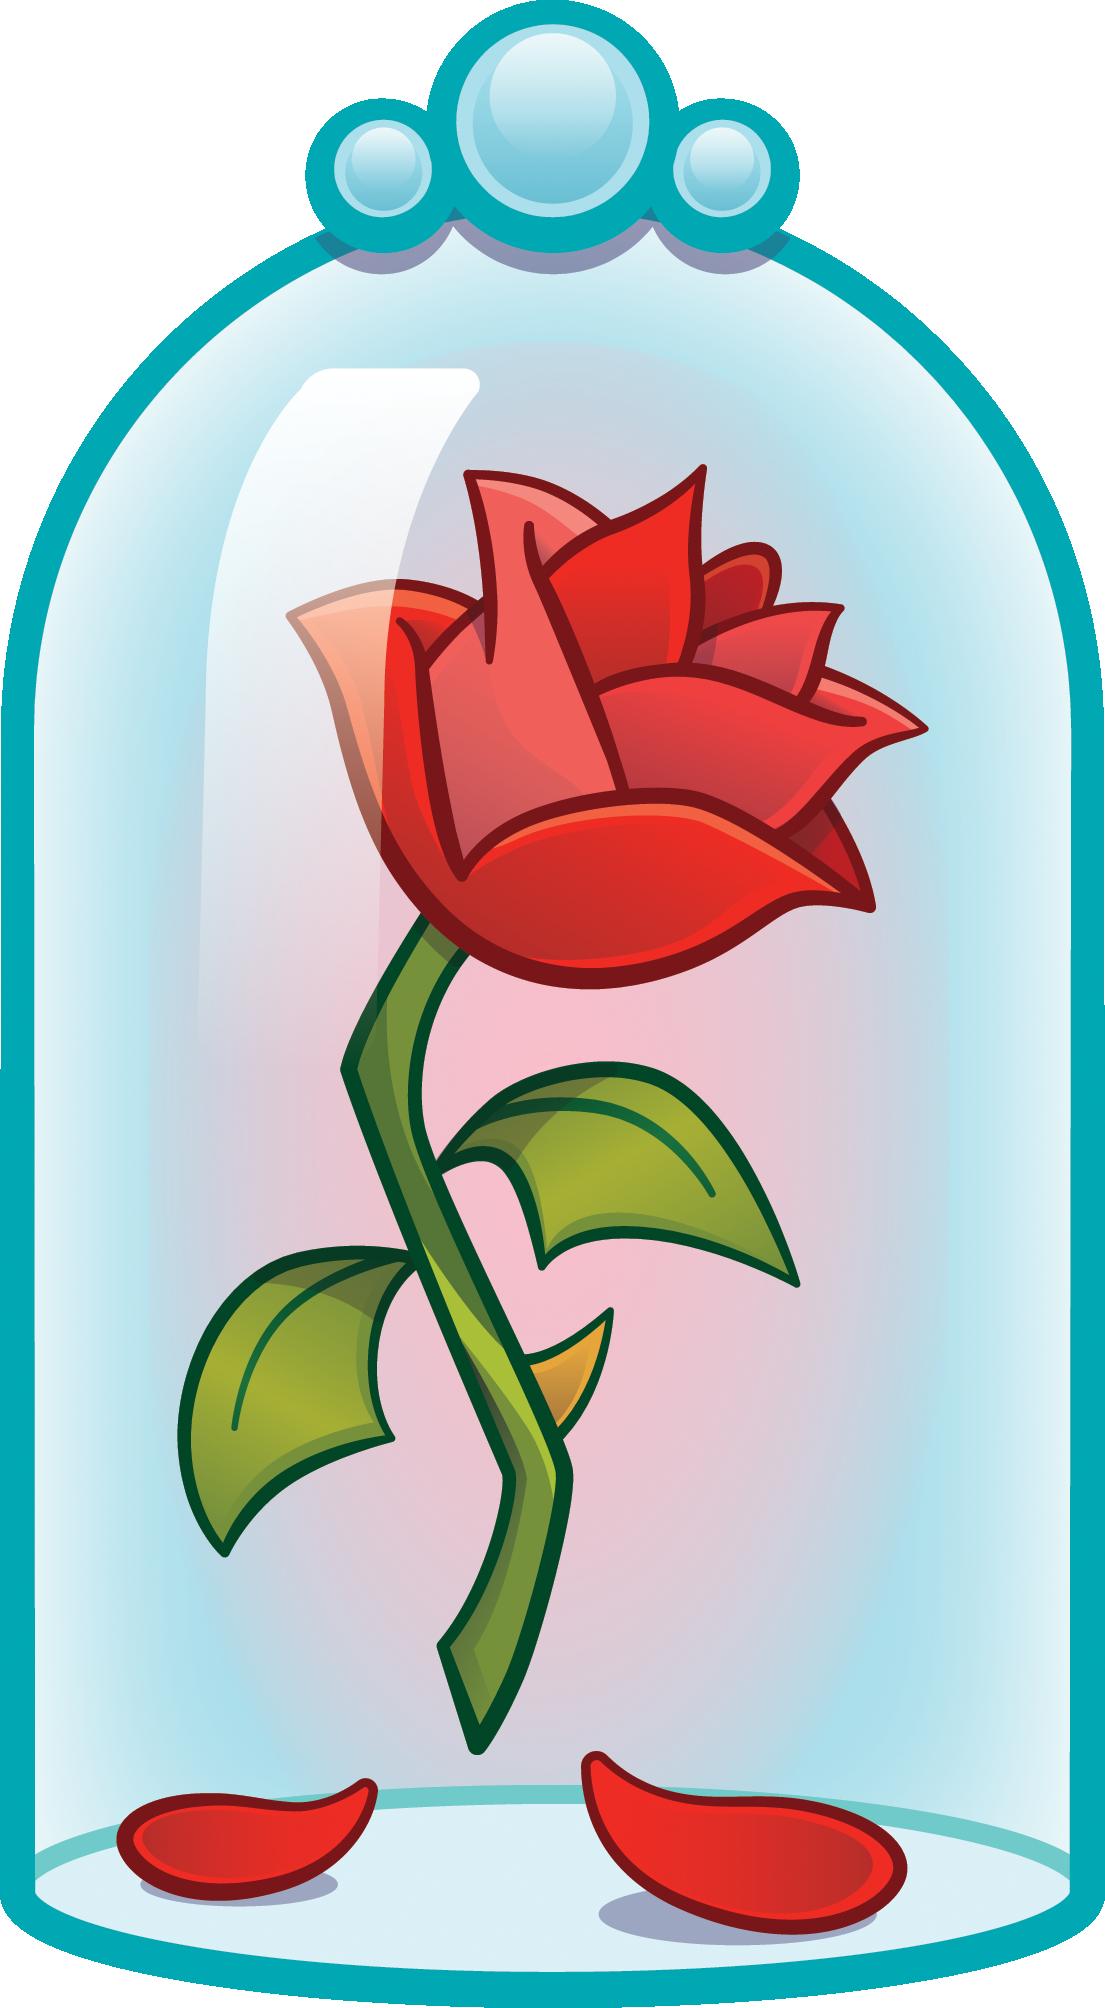 The enchanted rose as an emoji drawing by disney the enchanted rose as an emoji drawing by disney beautyandthebeast izmirmasajfo